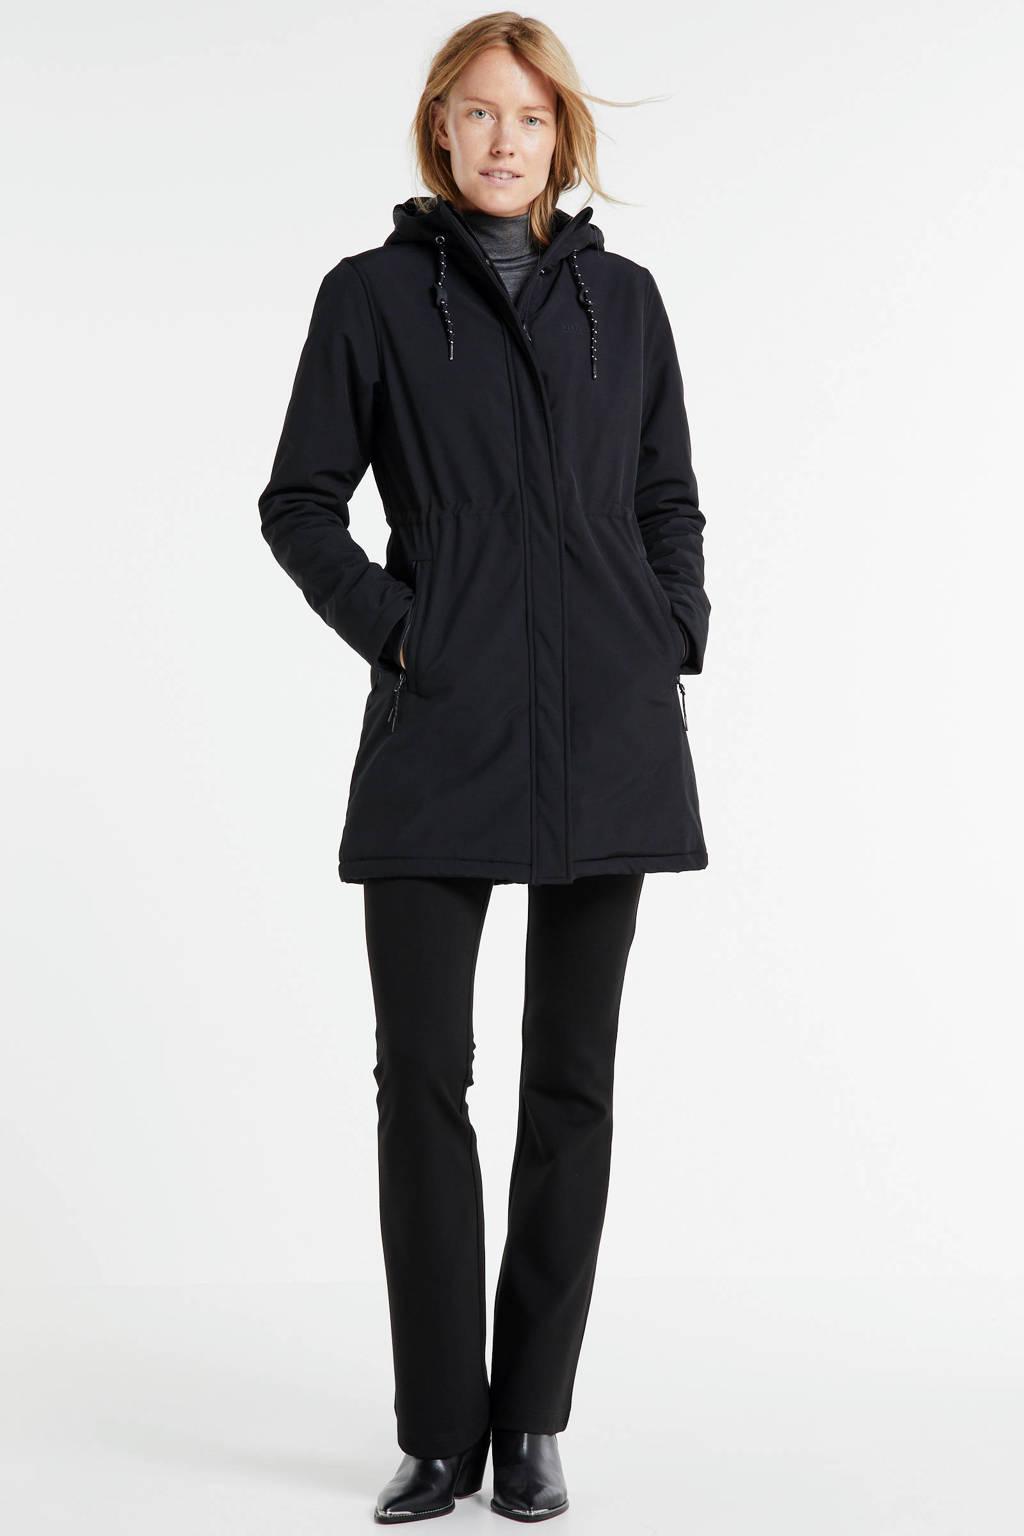 Shoeby Eksept flared broek Harby zwart, Zwart